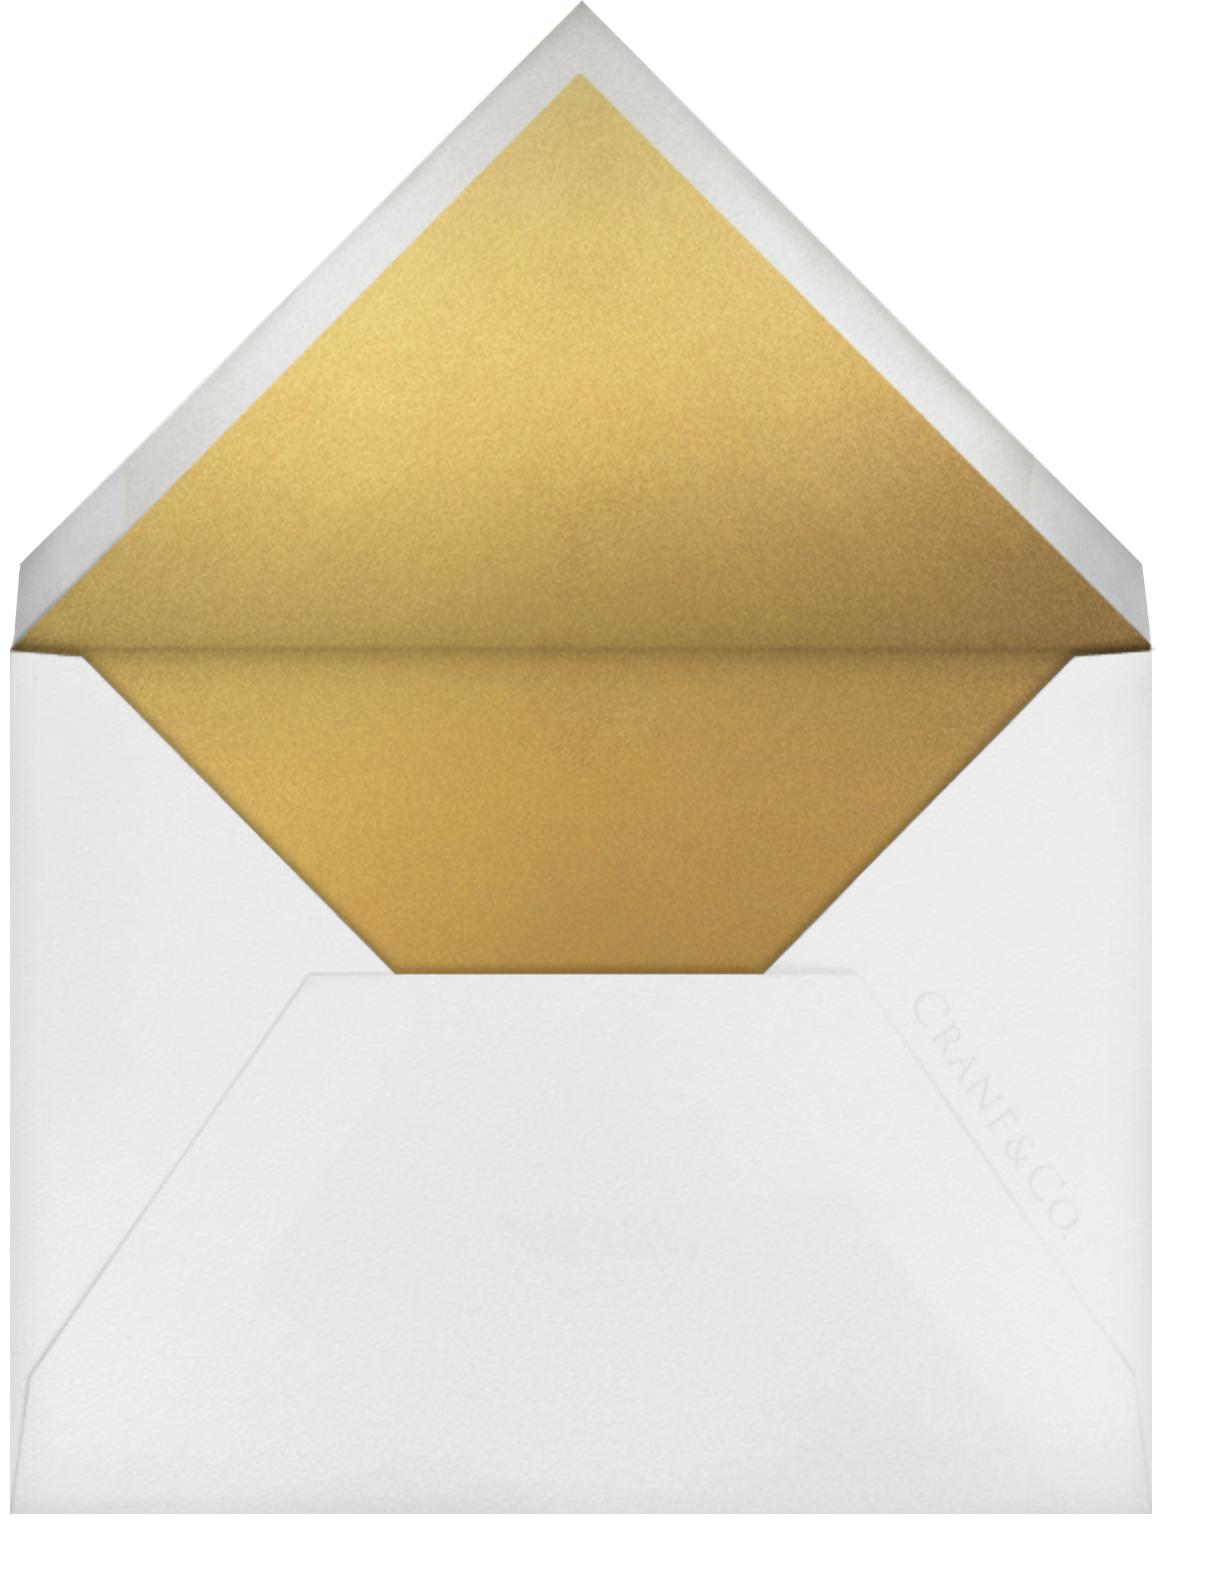 Bobbin I (Engagement) - Gold - Paperless Post - Engagement party - envelope back